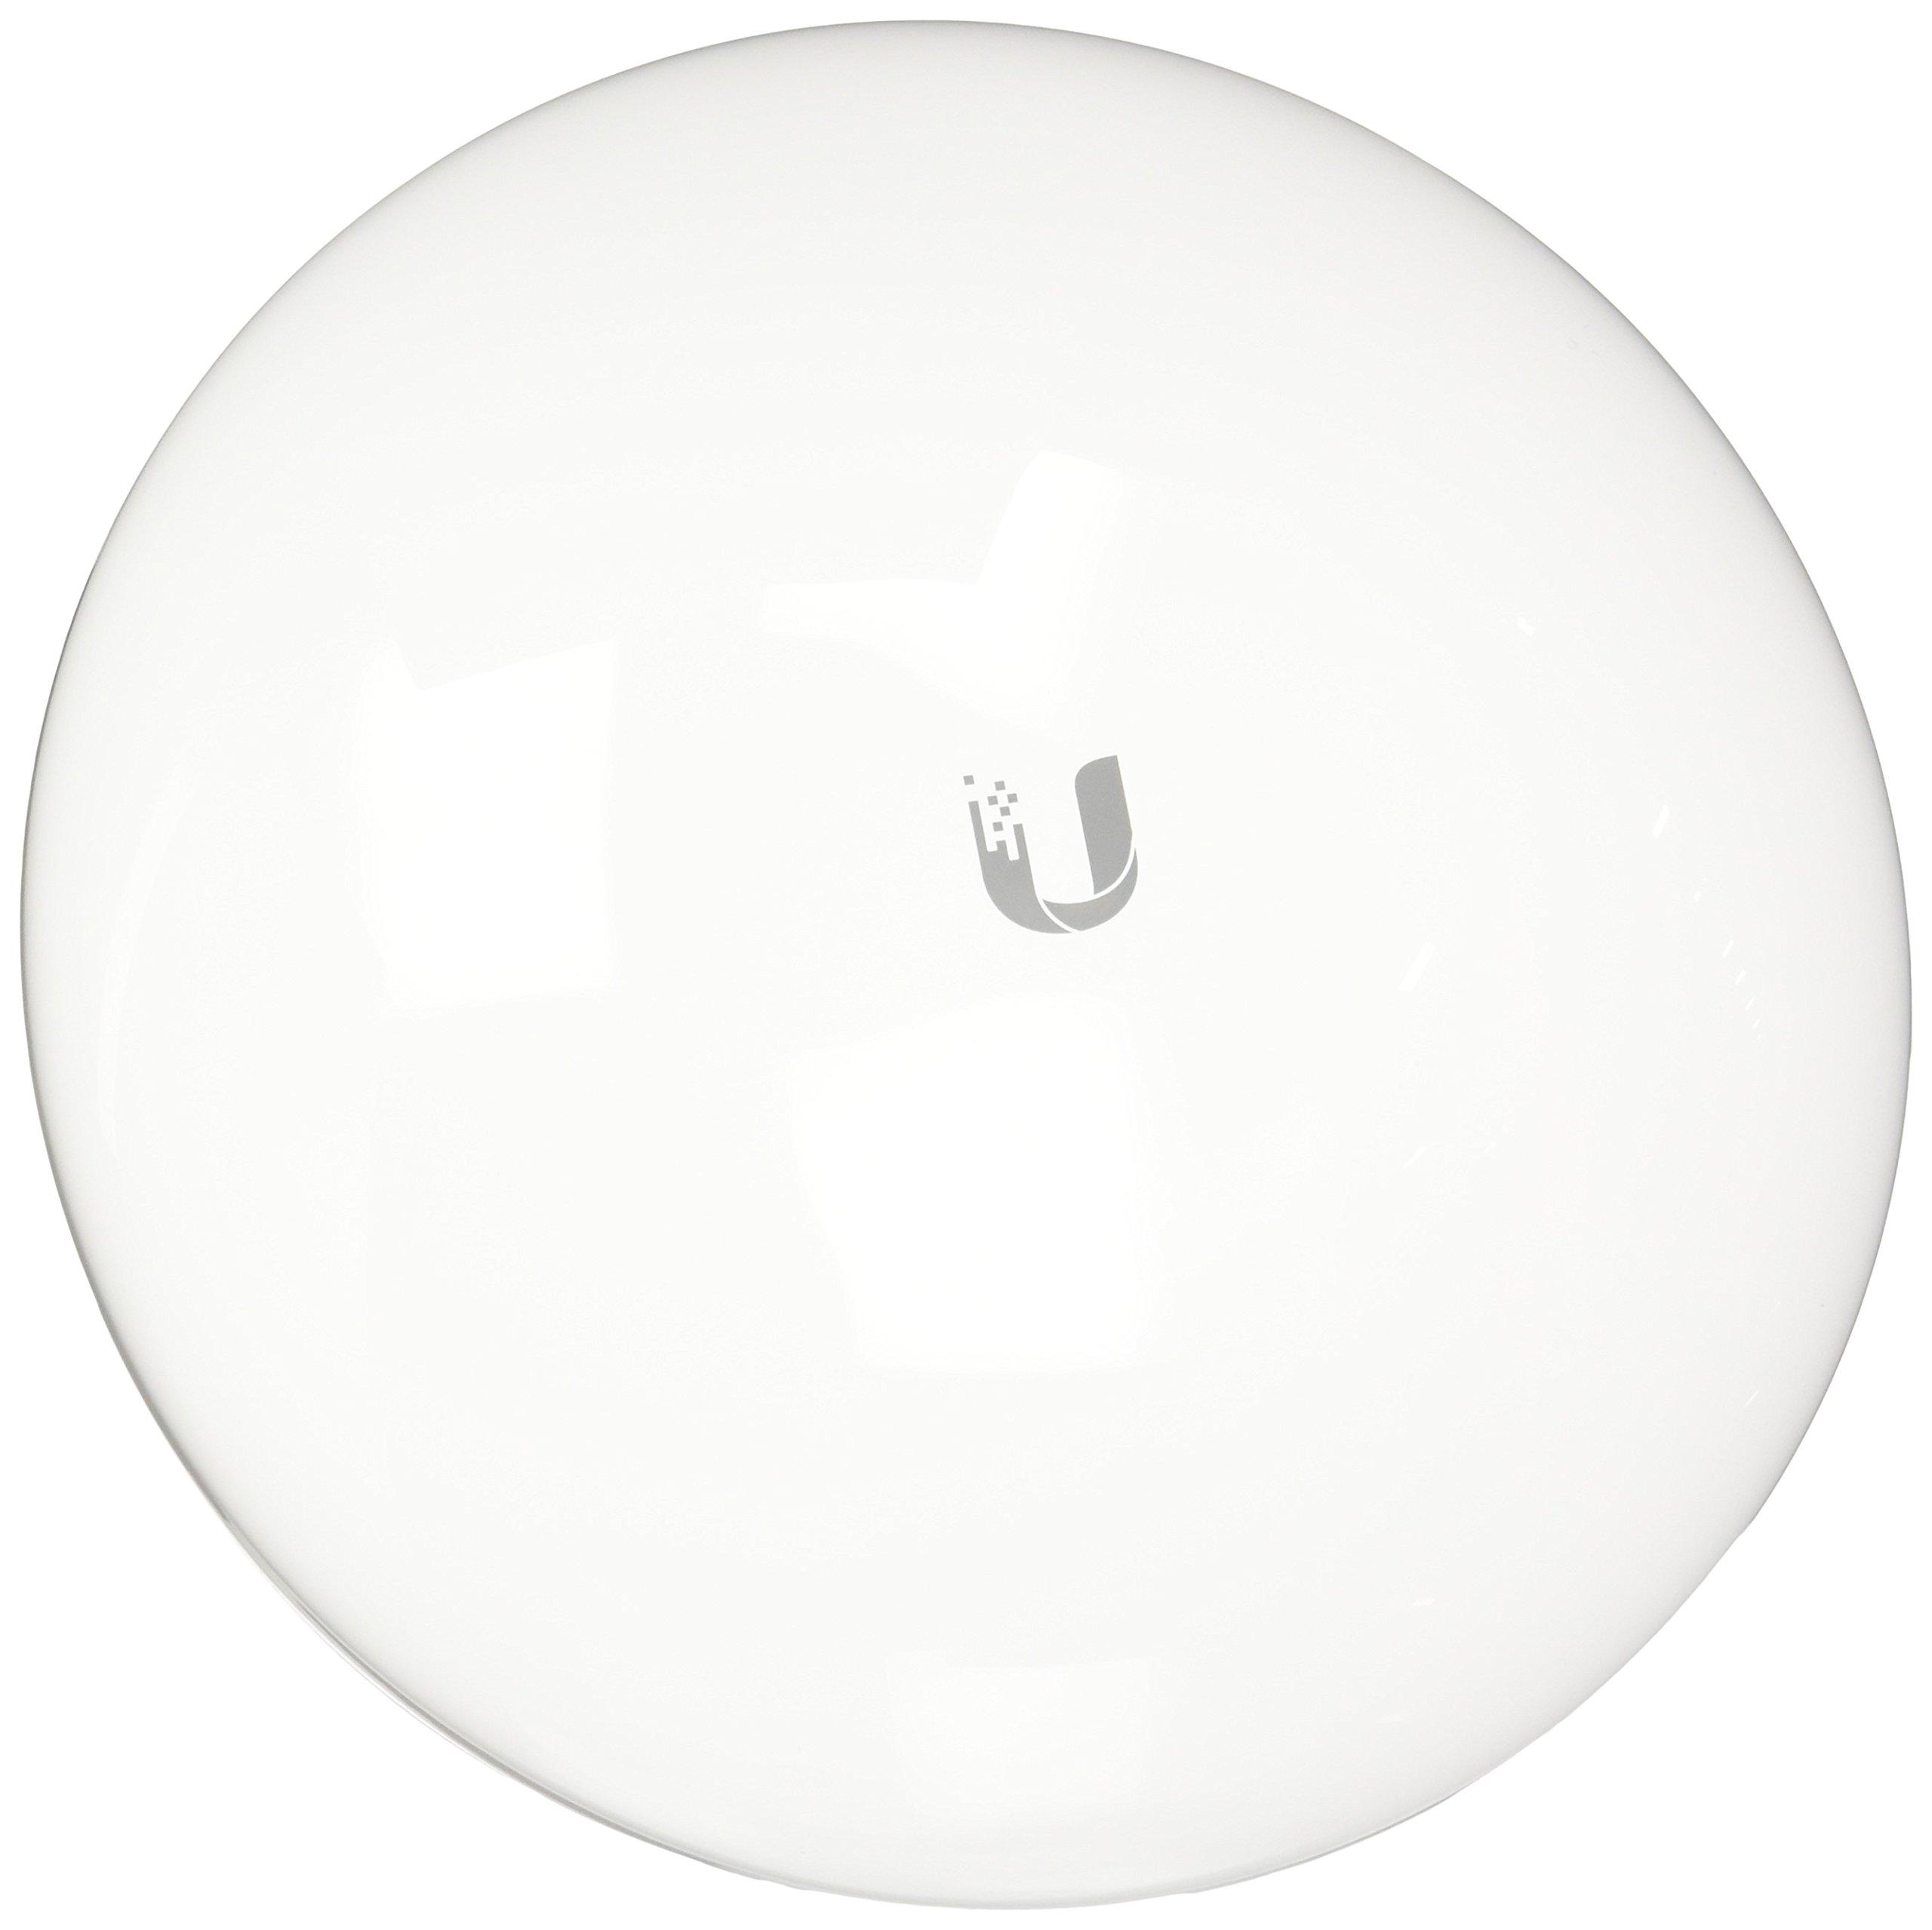 Ubiquiti Nanobeam M5-16 Wireless Bridge (NBE-M5-16) by Ubiquiti Networks